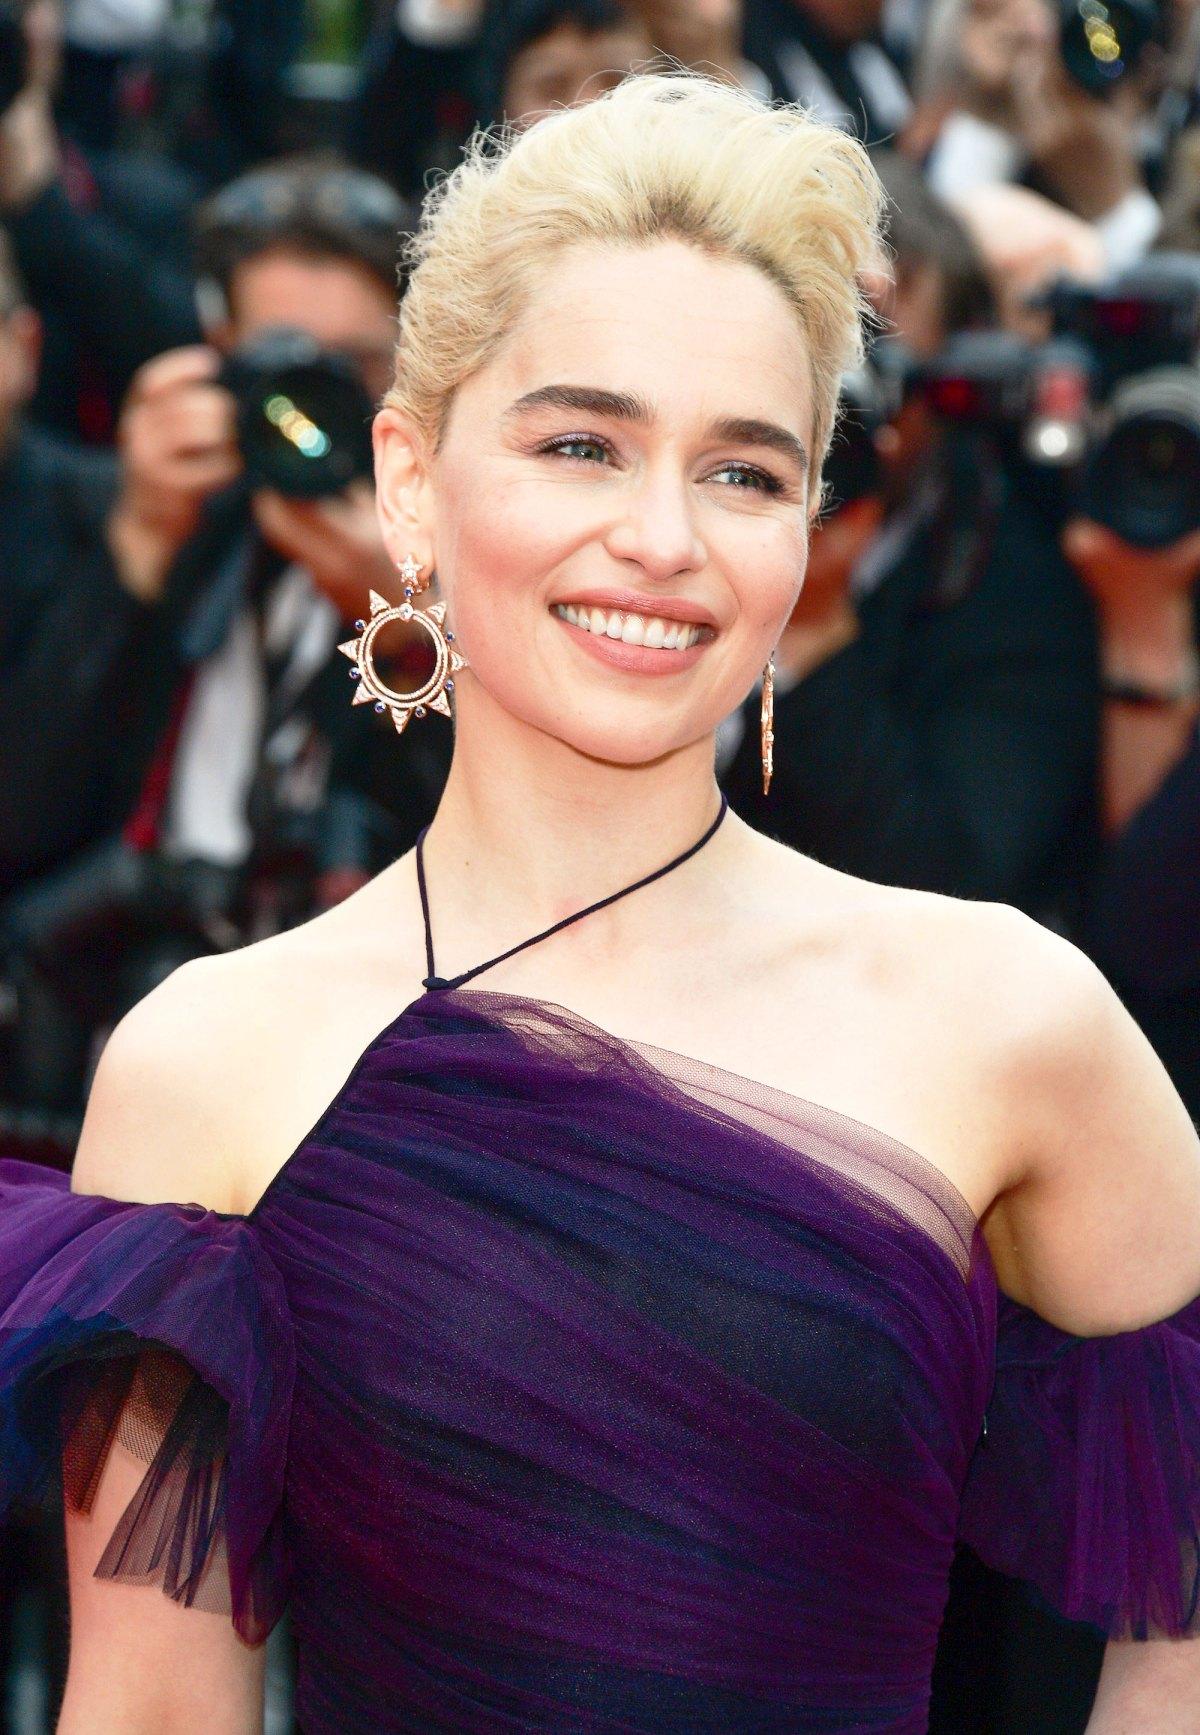 Emilia Clarkes Best Dresses And Outfits Pics